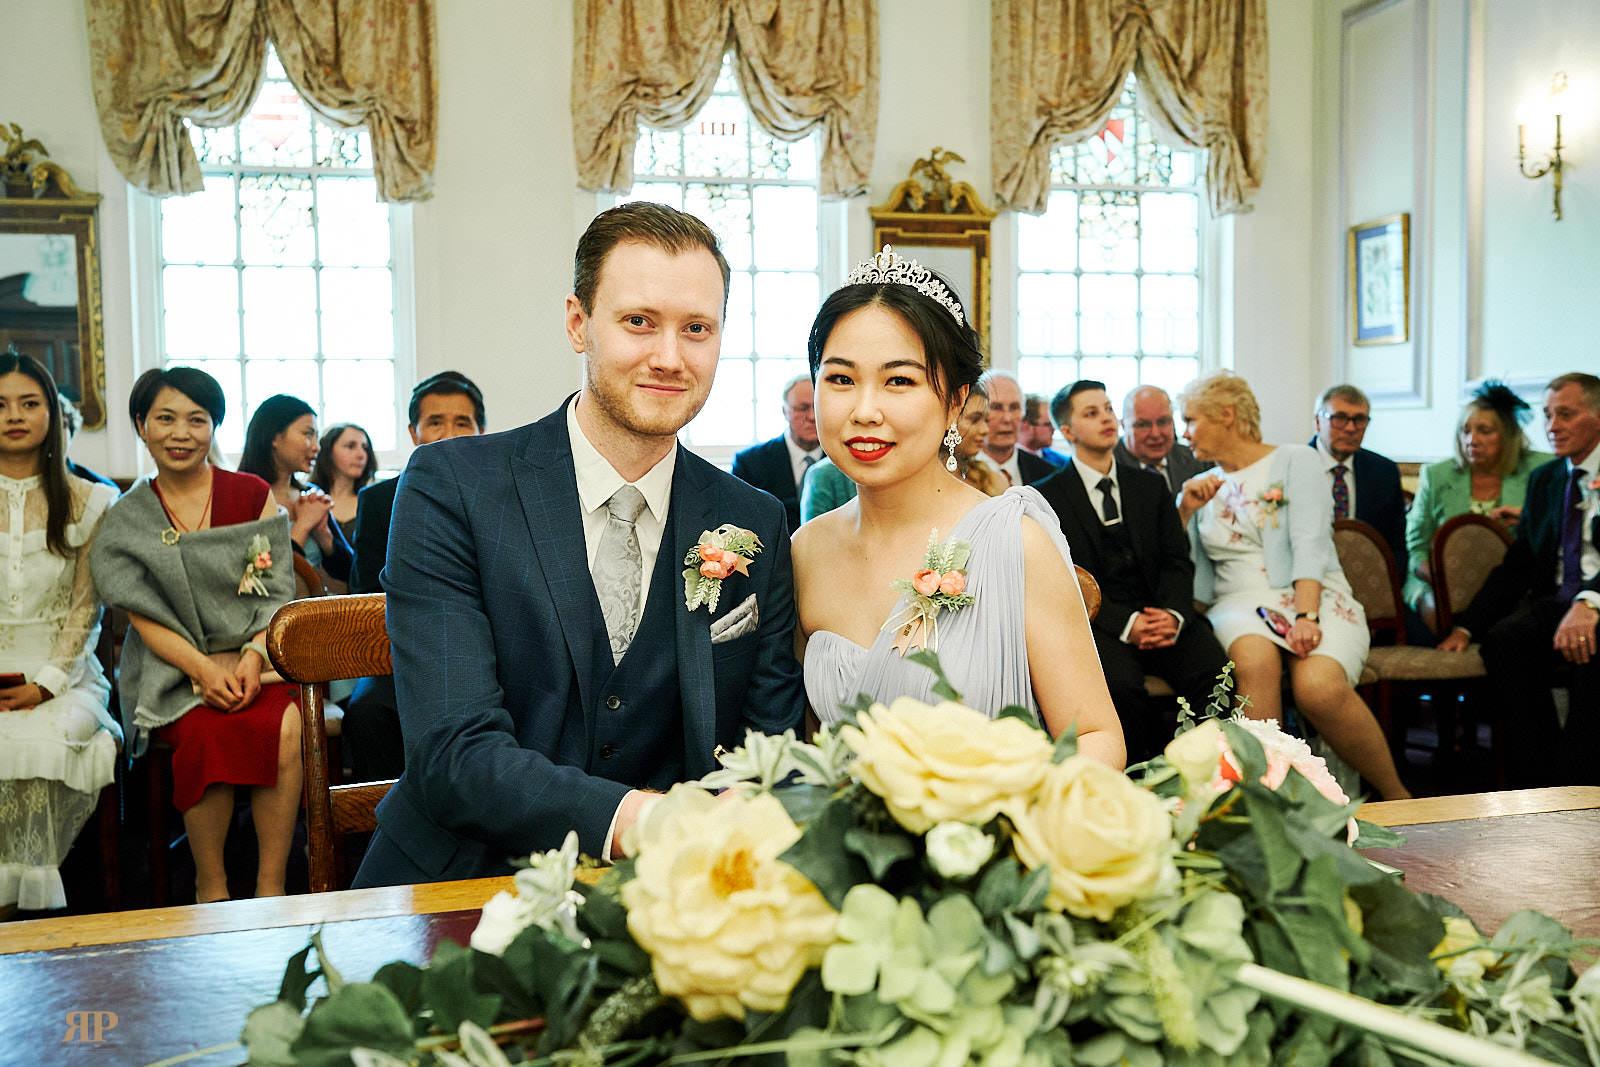 Helen Zhang Wedding at Register Office Oxford on 15 June 2019.